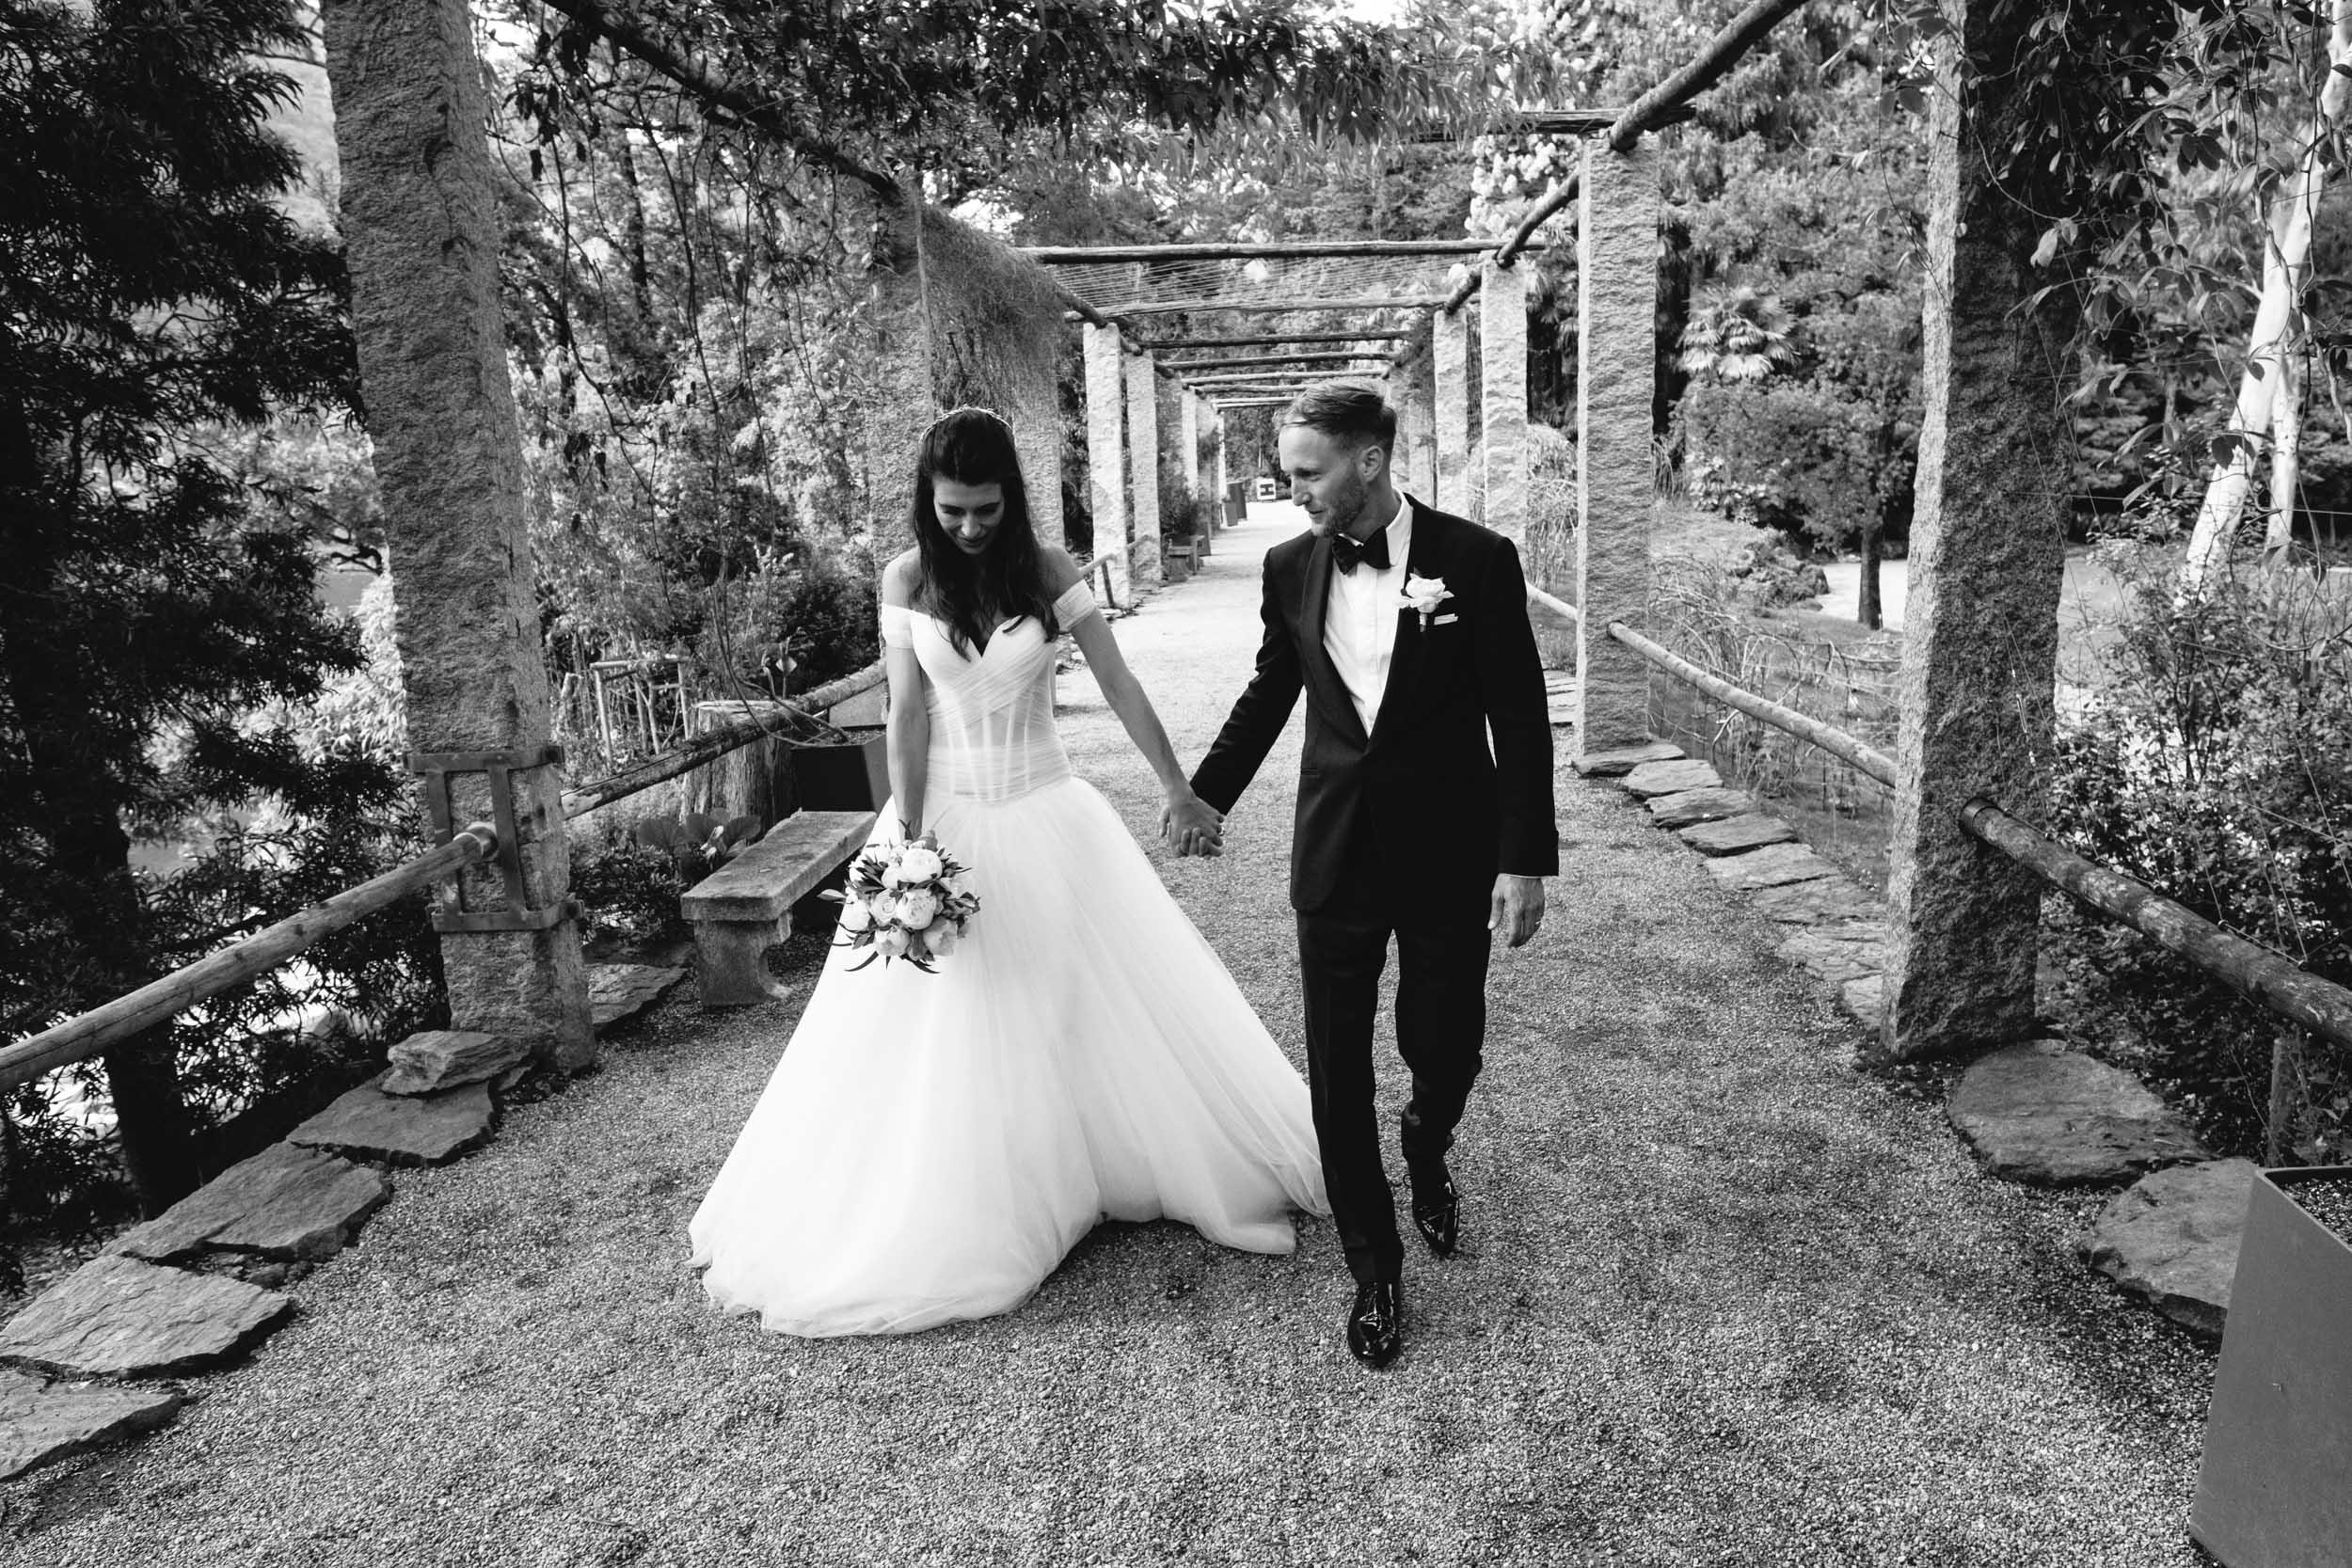 olivia-andreas-wedding-switzerland-395.jpg